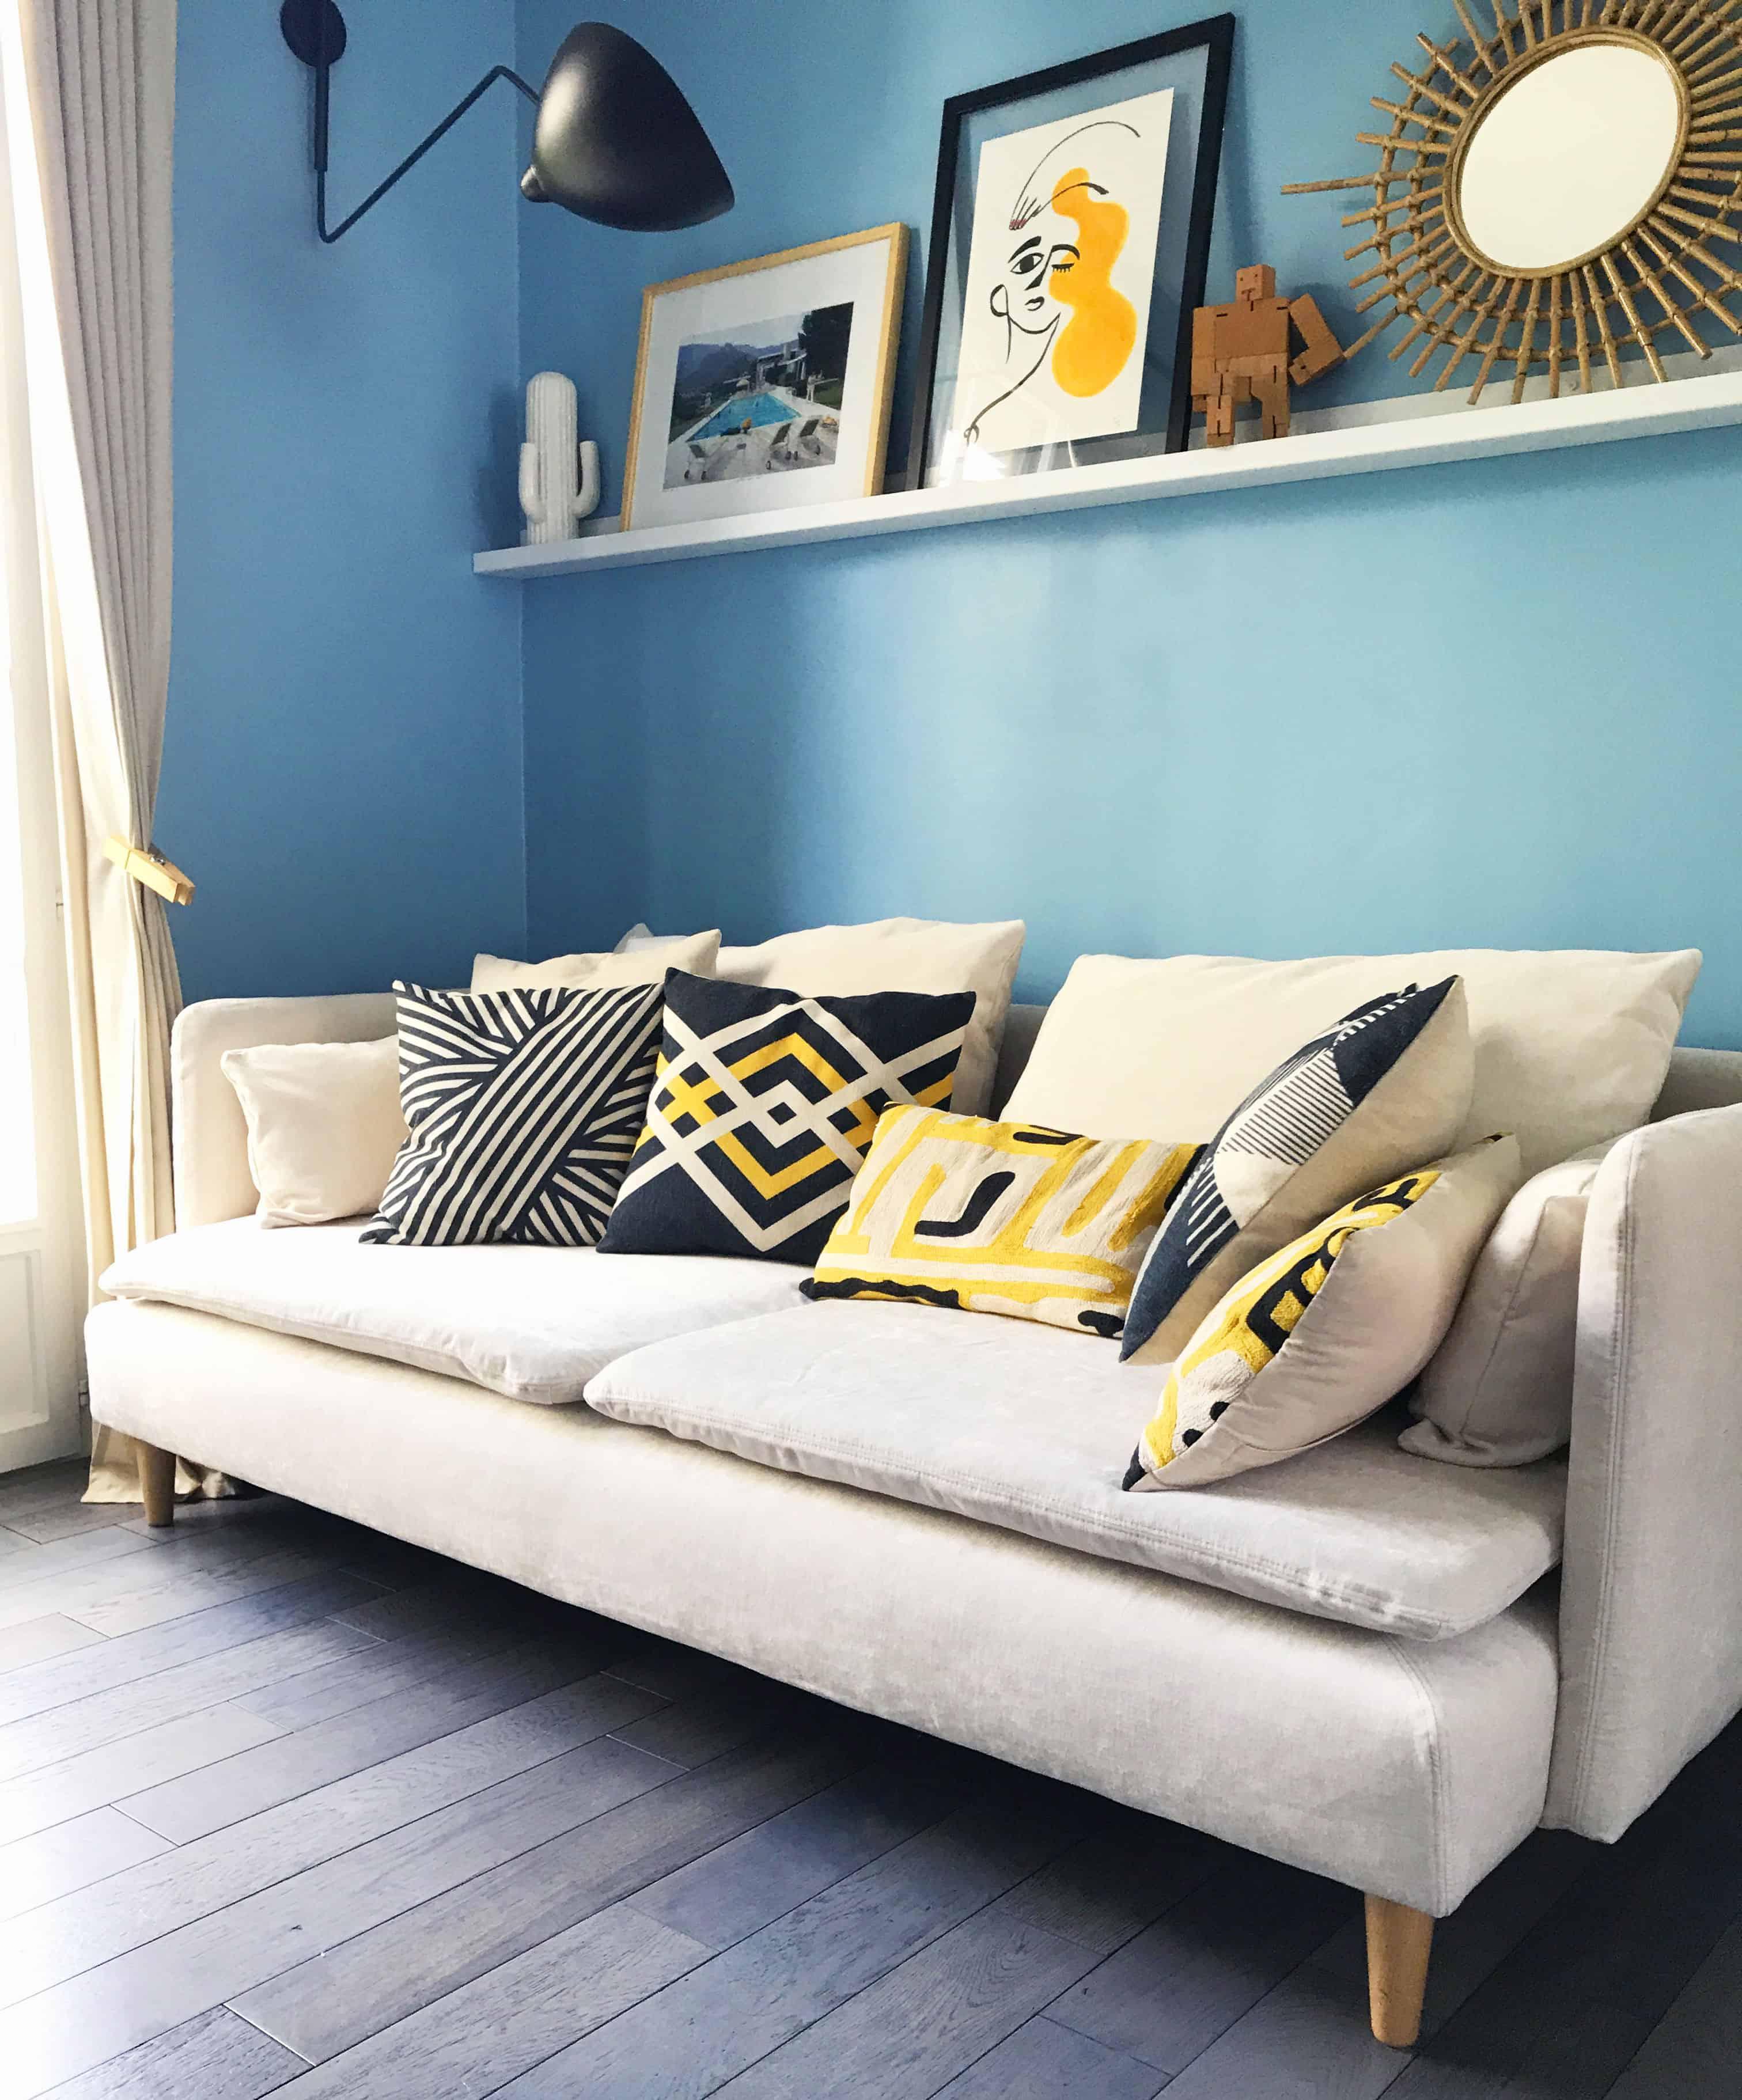 changer sa housse de canap ikea avec bemz. Black Bedroom Furniture Sets. Home Design Ideas